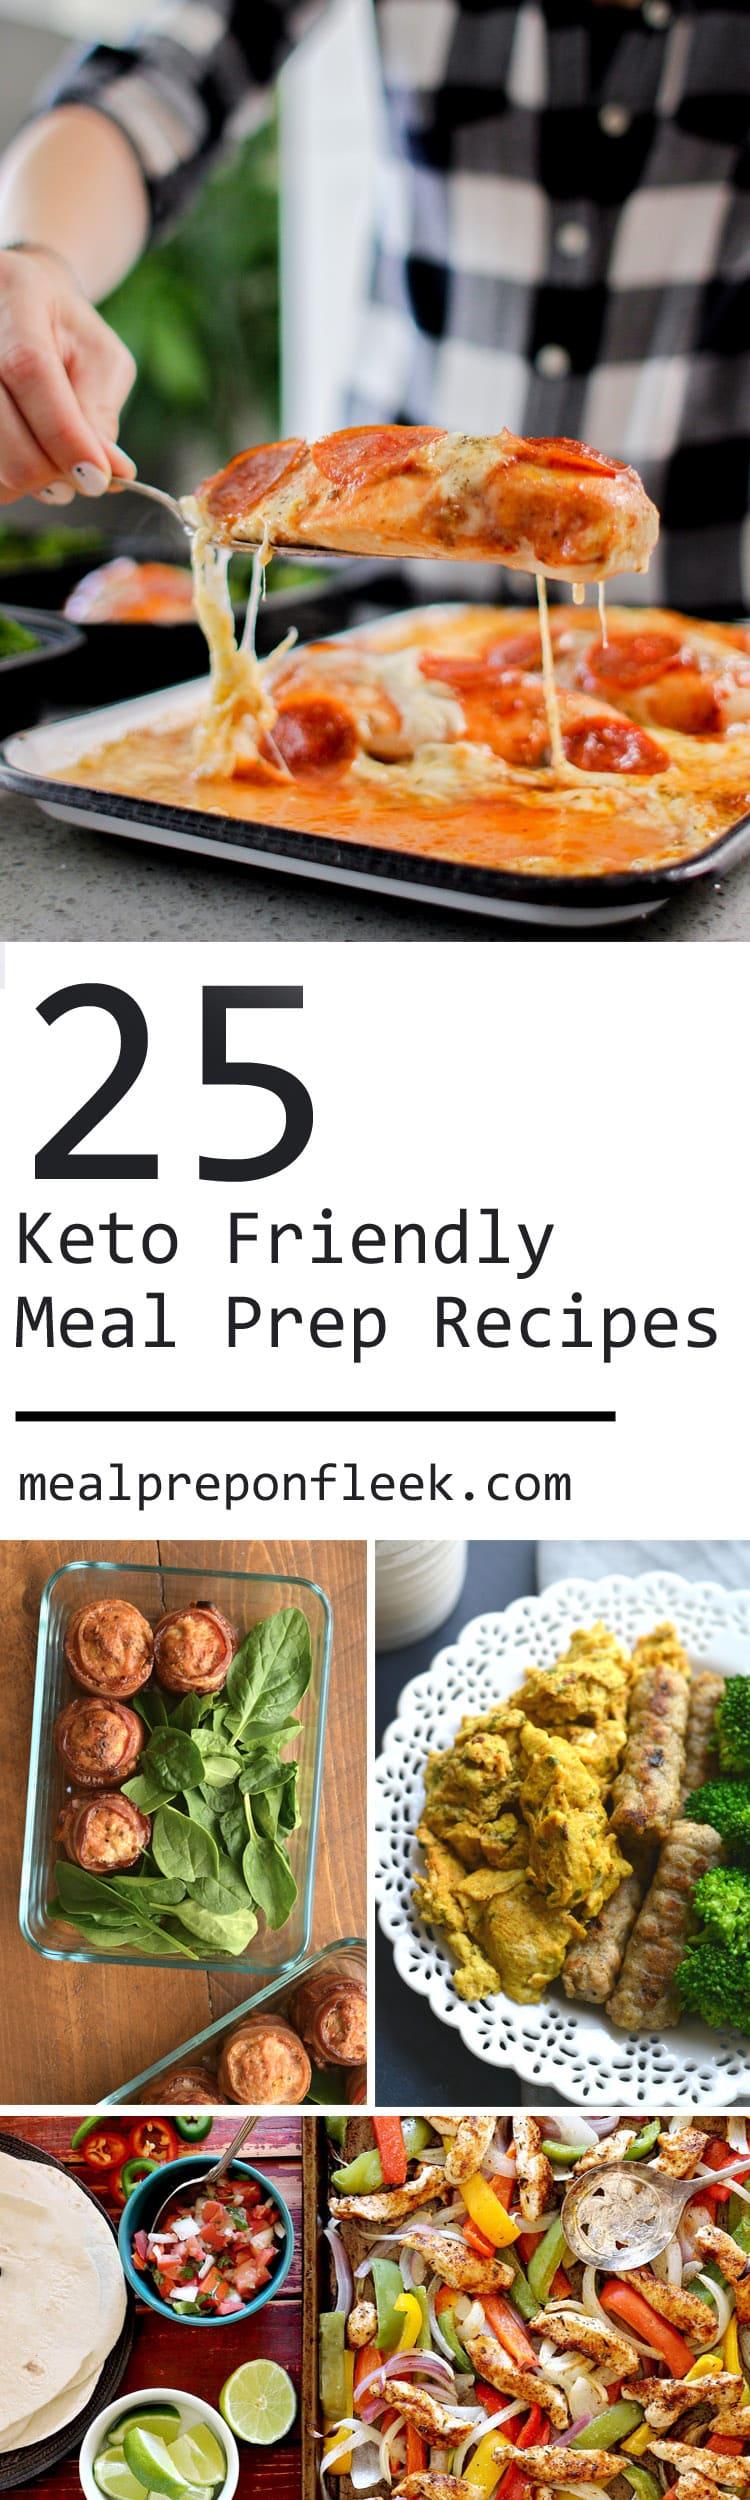 25 Amazing Keto Meal Prep Recipes Meal Prep On Fleek